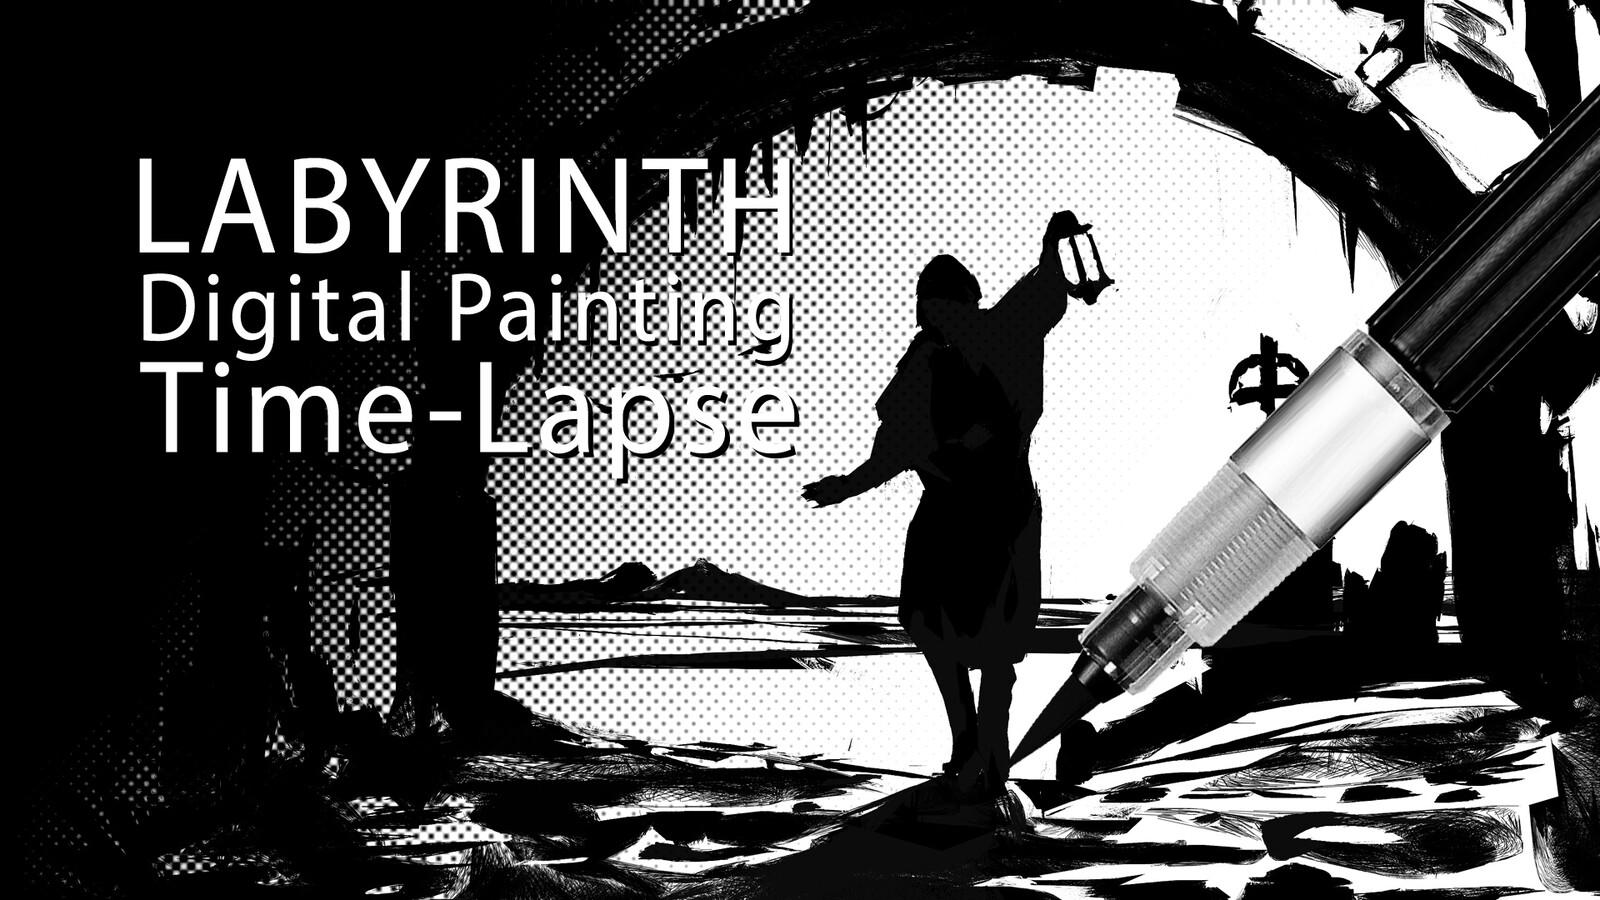 Labyrinth (vignette)